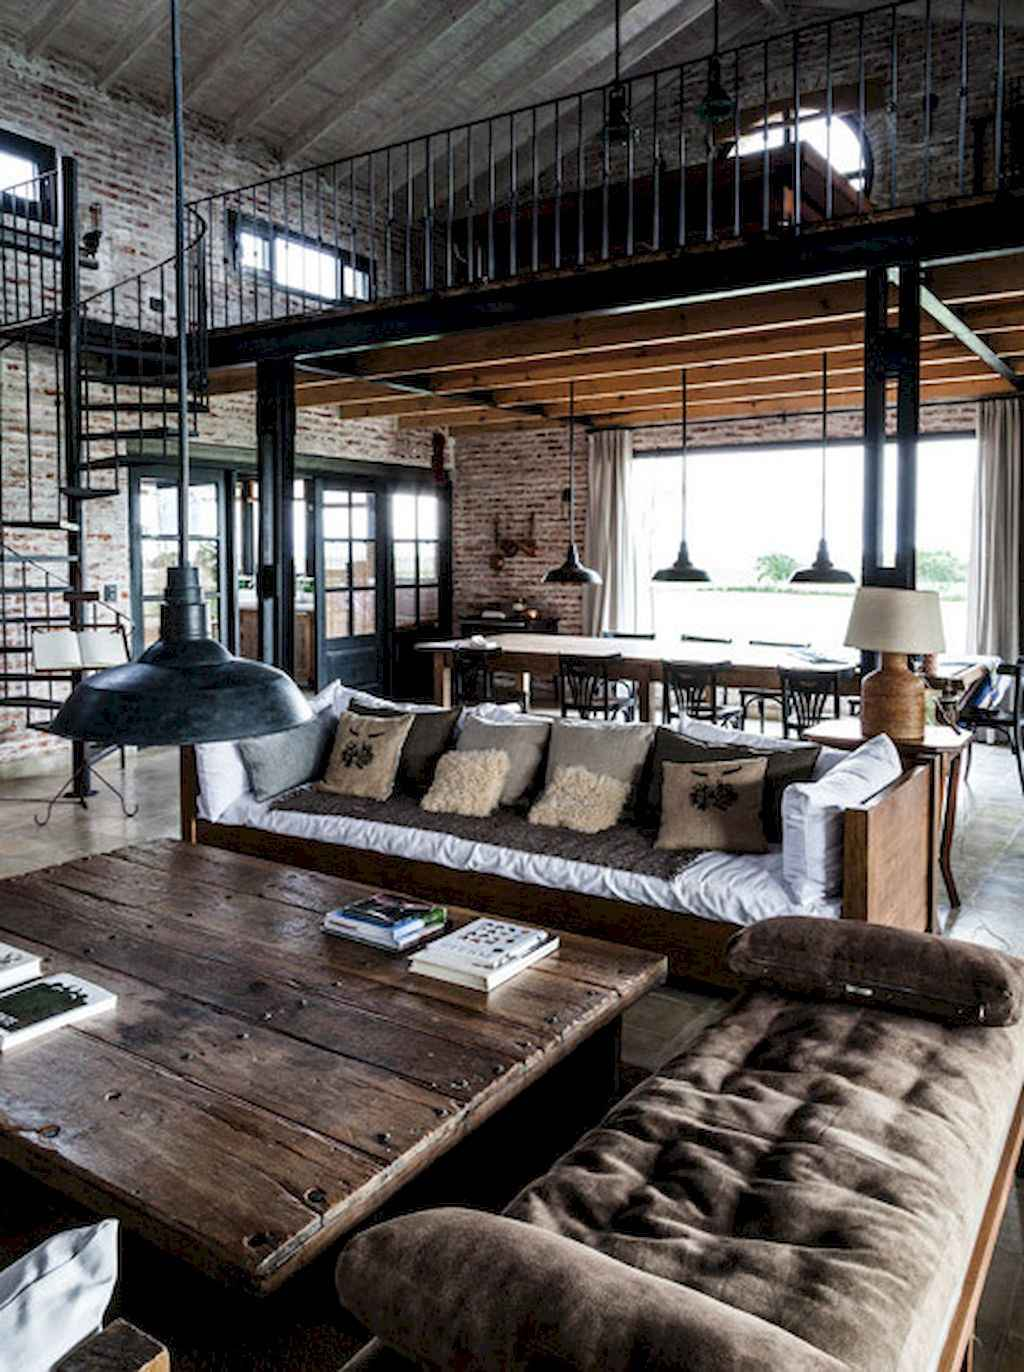 Cool creative loft apartment decorating ideas (43)